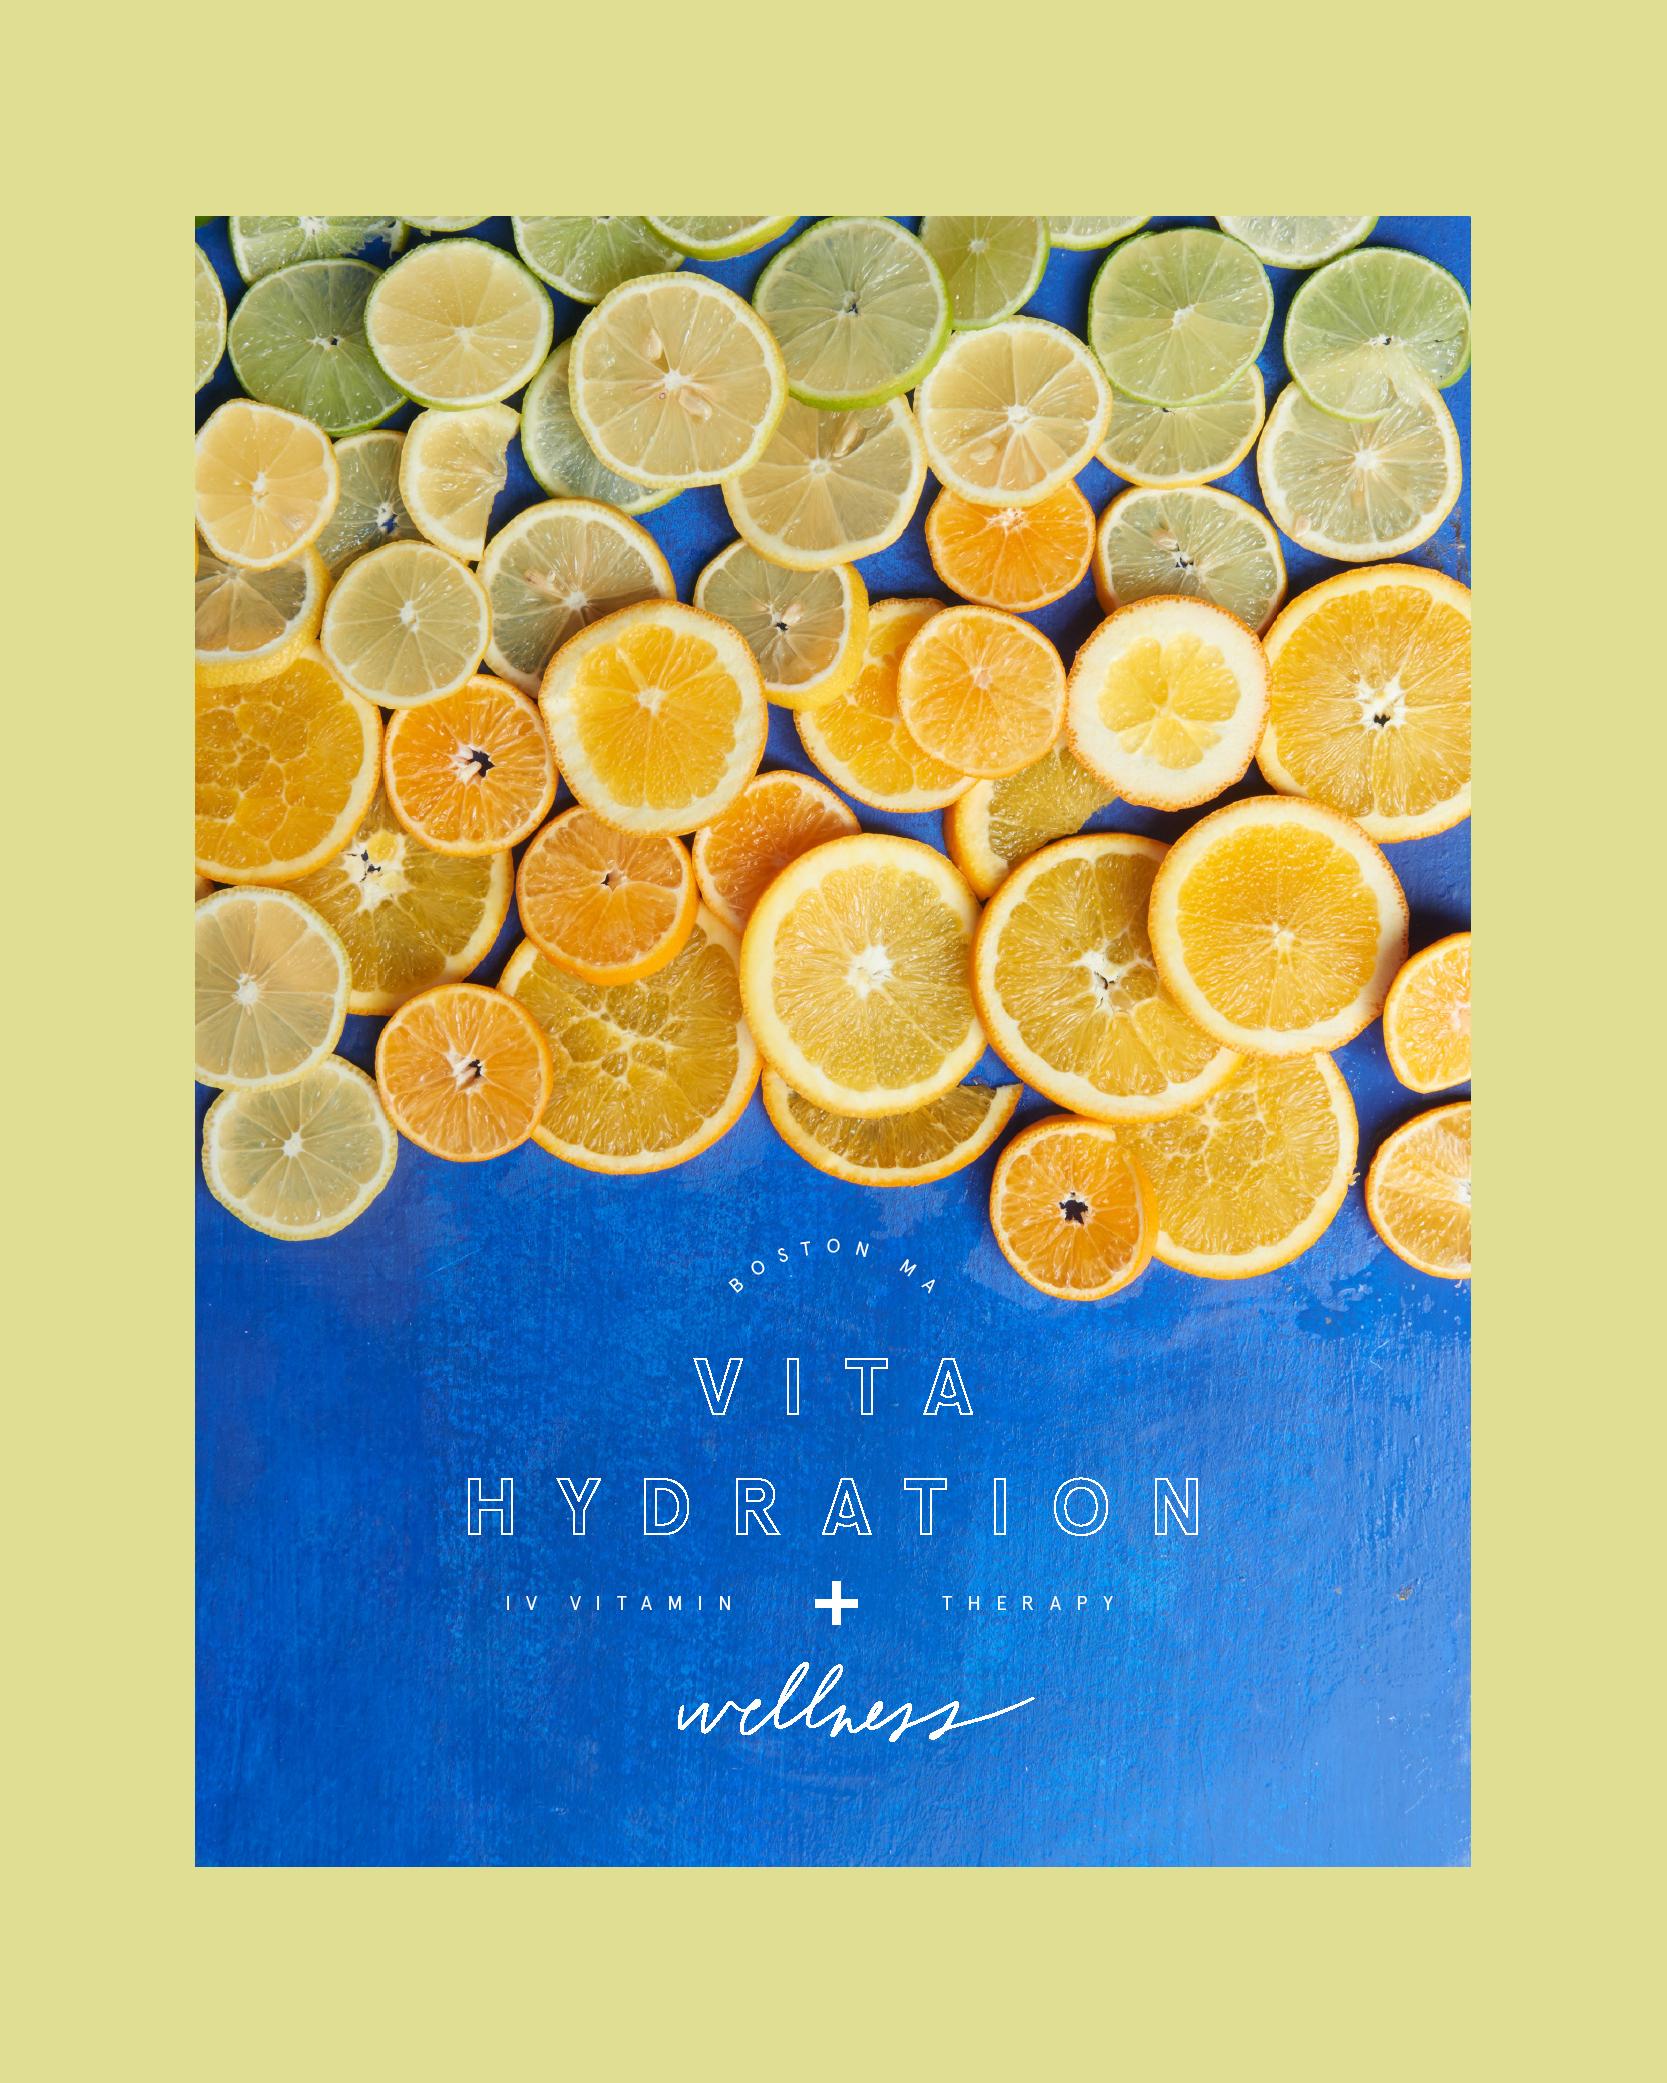 Vitahydration_Portfolio_Pricing3.png